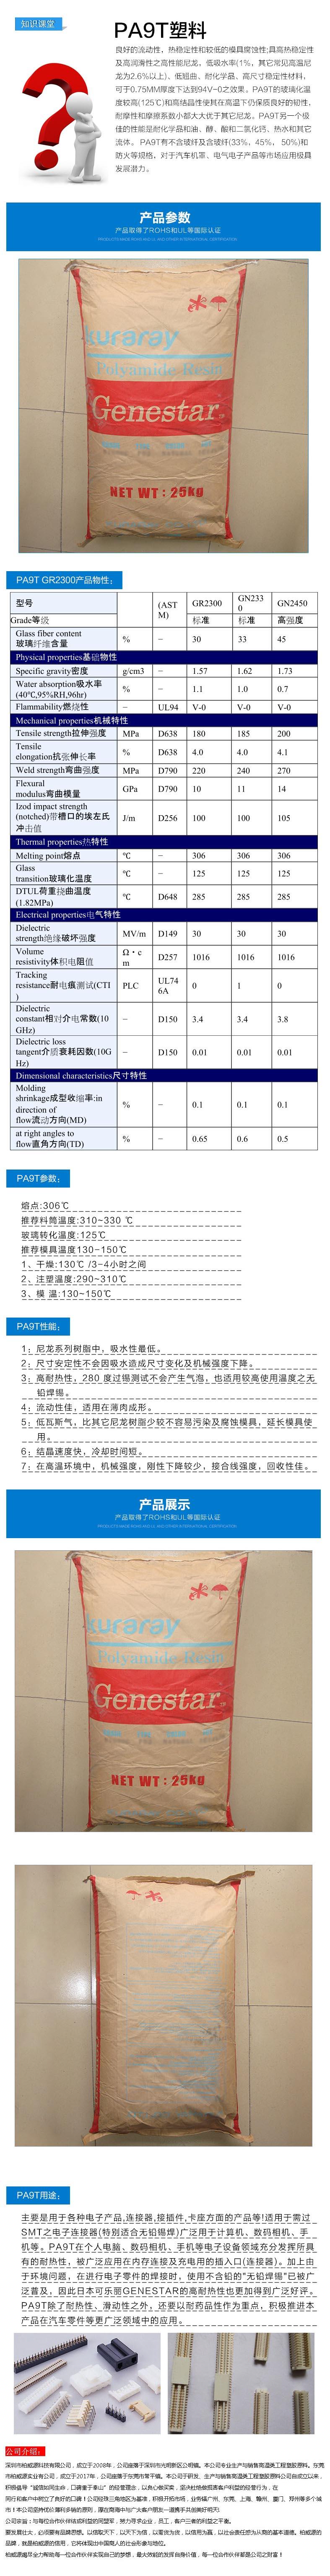 耐高温 PA9T GR2300